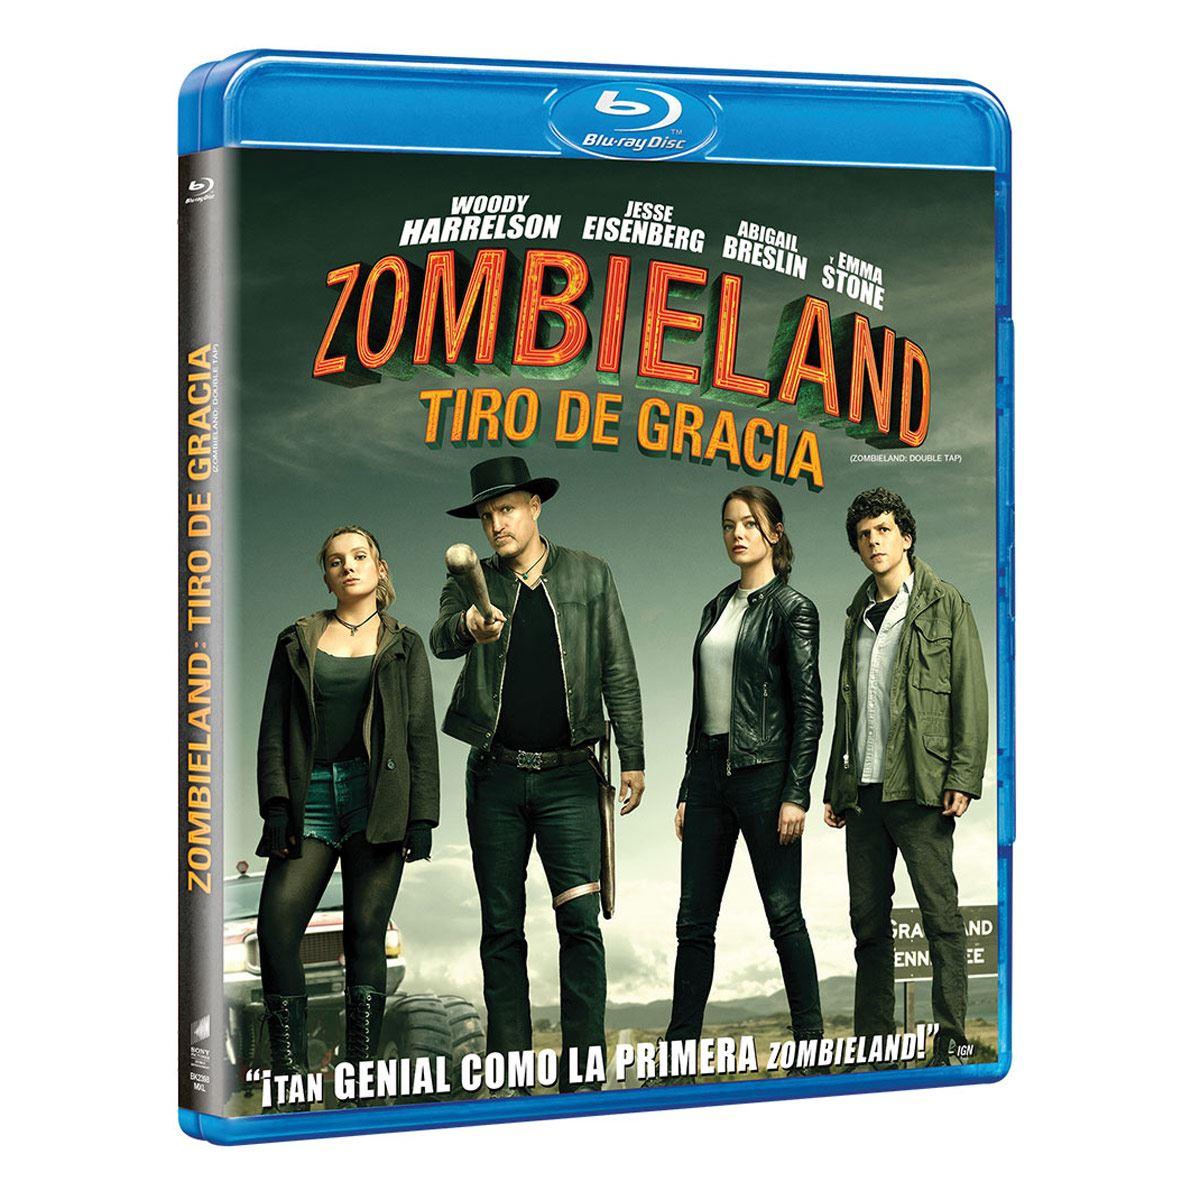 Blu-Ray Zombieland Tiro de Gracia